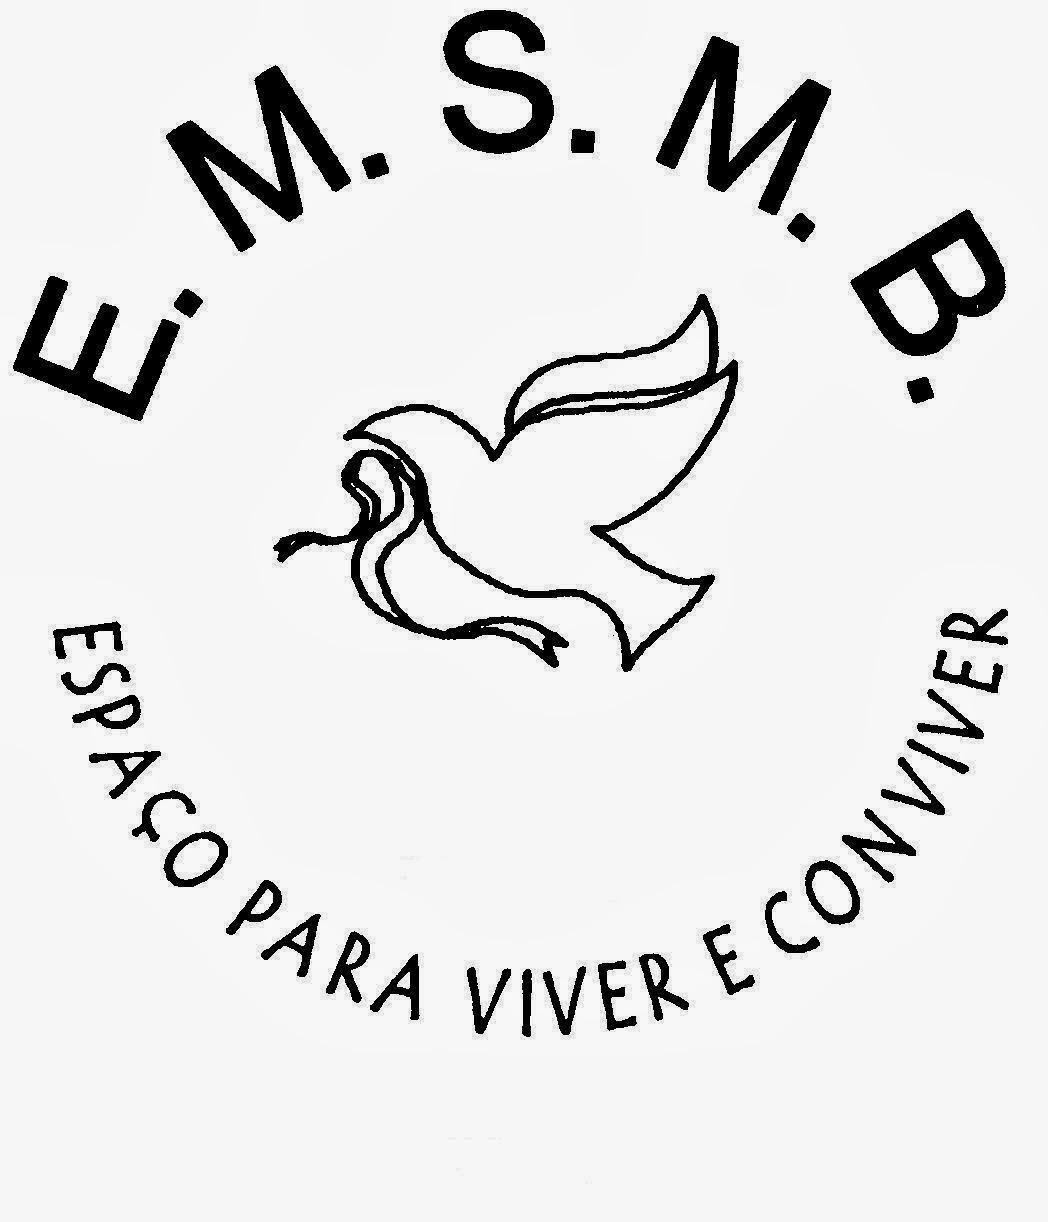 EMSMB